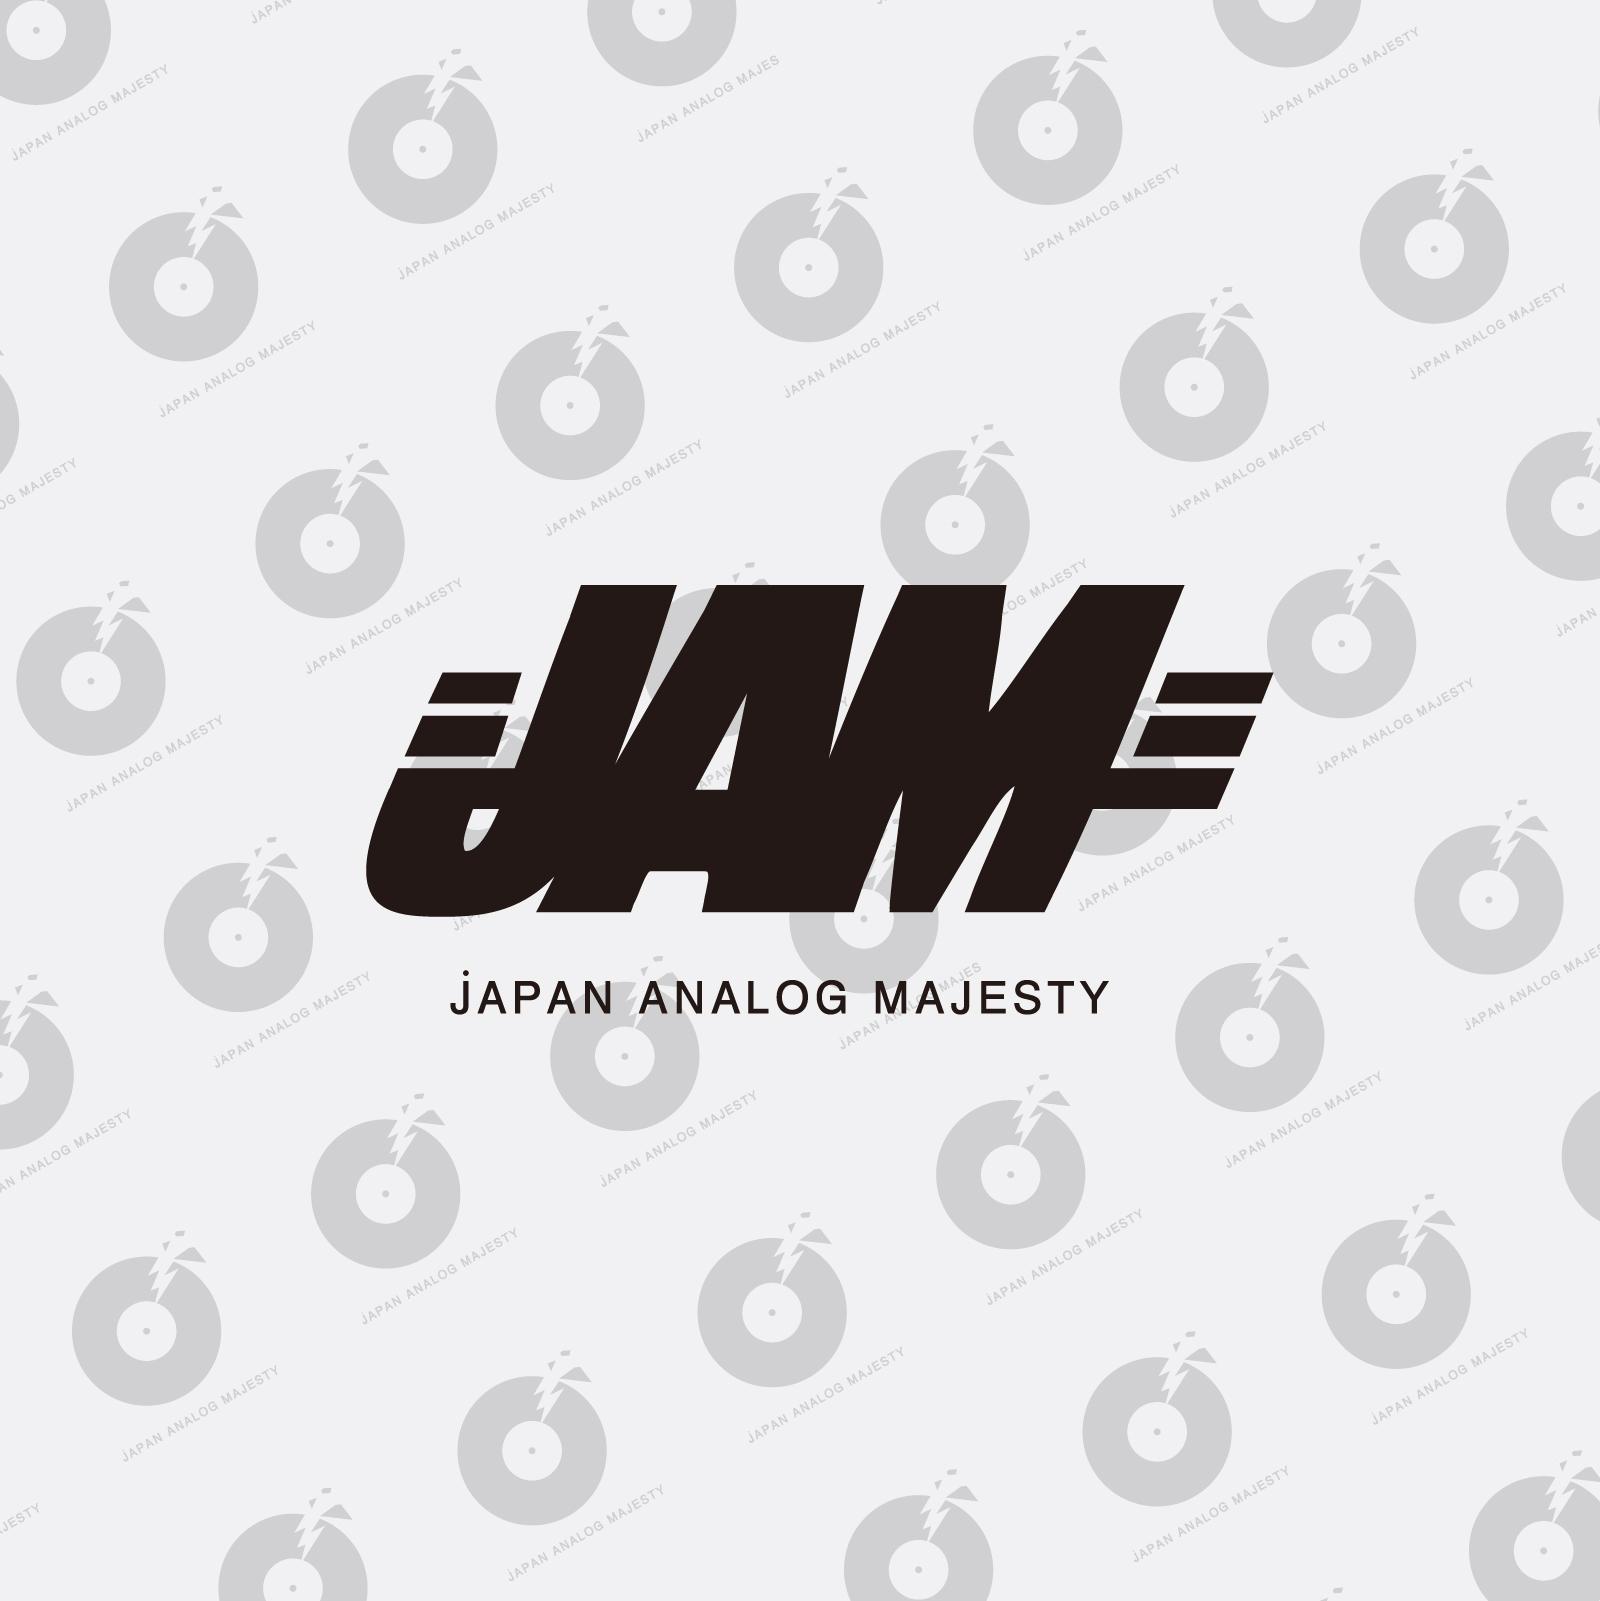 JAPAN ANALOG MAJESTY